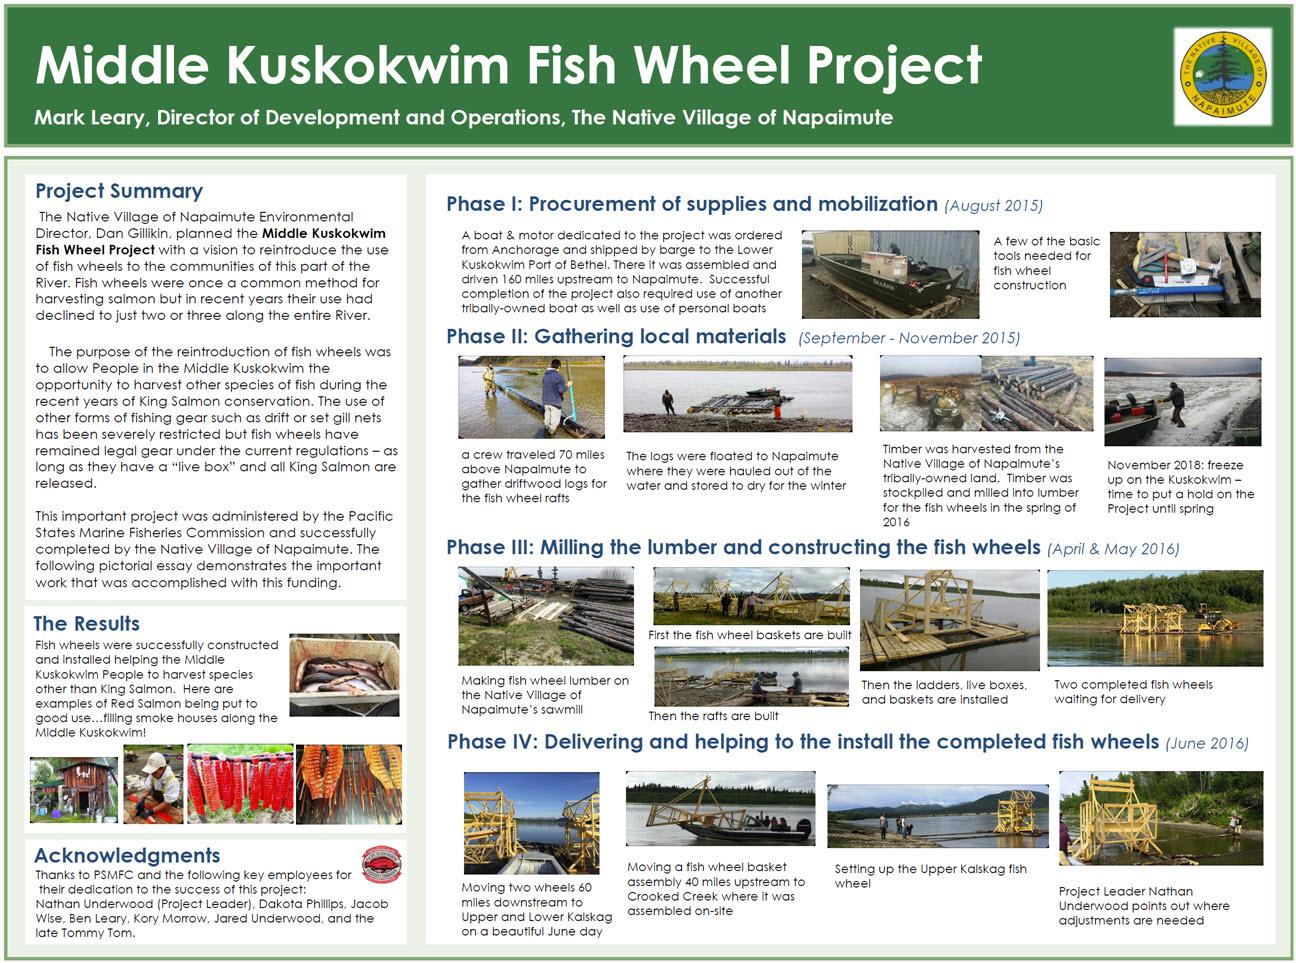 Middle Kuskokwim Fish Wheel Project